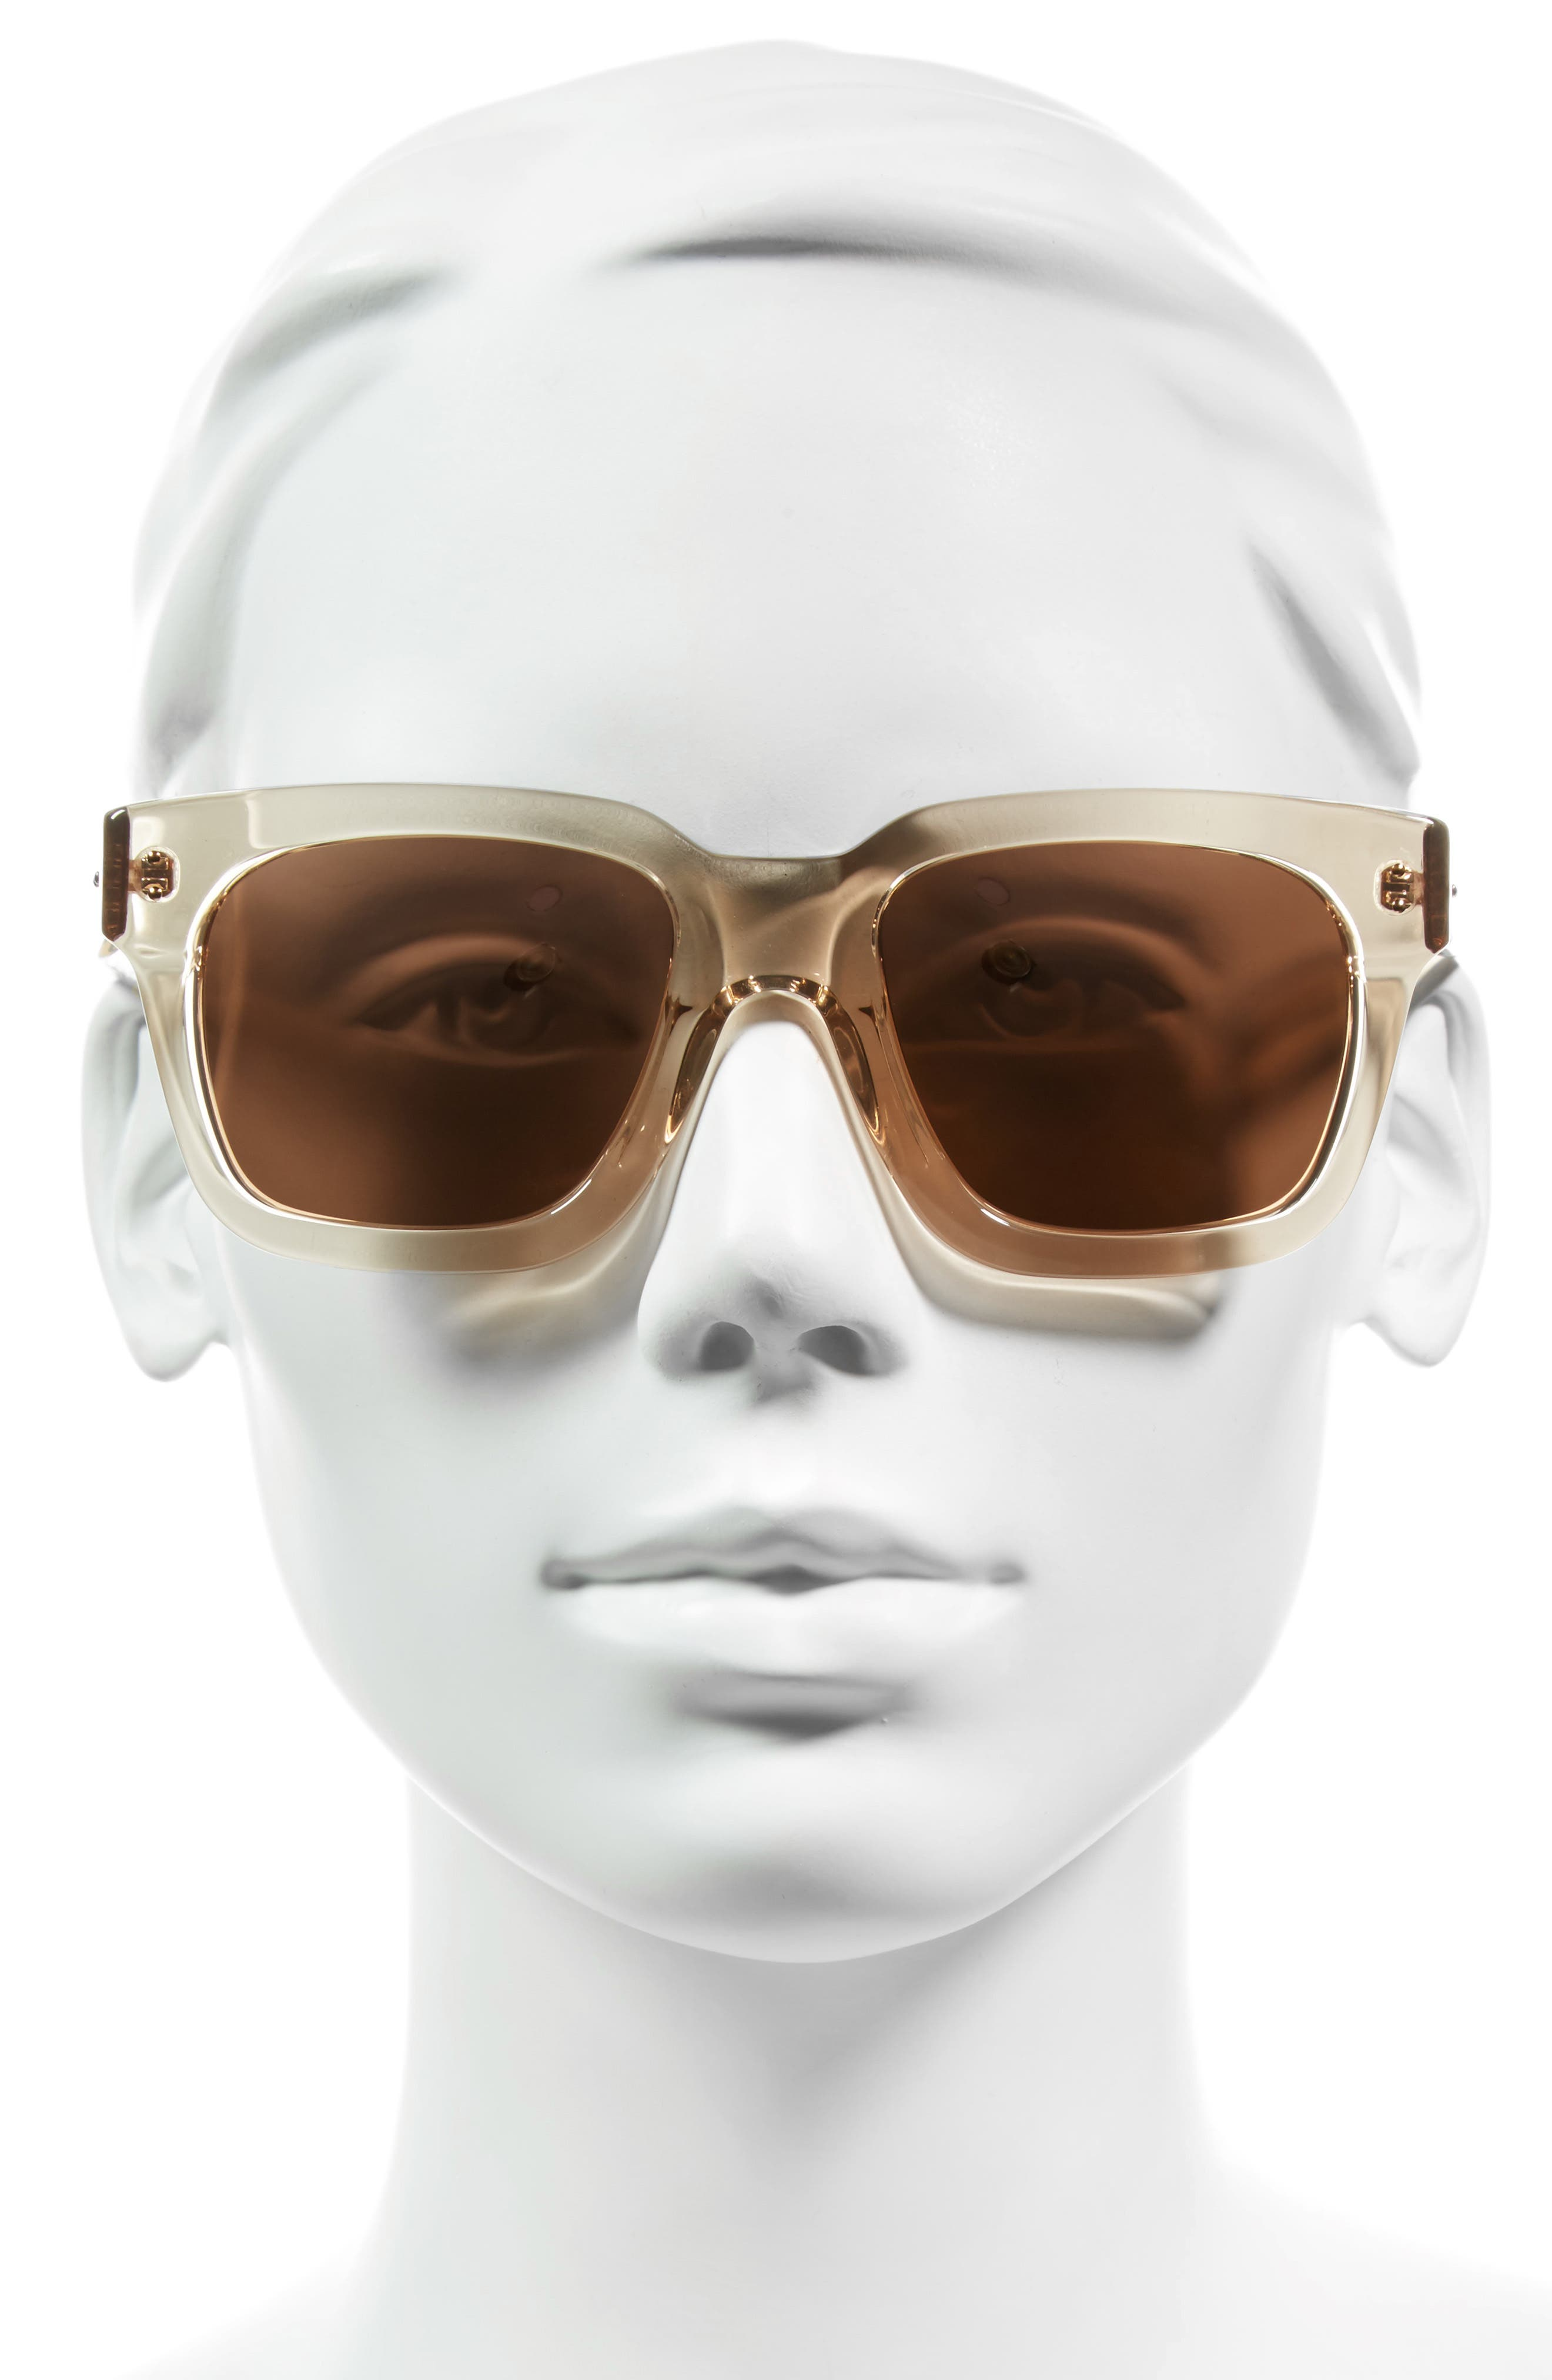 50mm Sunglasses,                             Alternate thumbnail 2, color,                             020